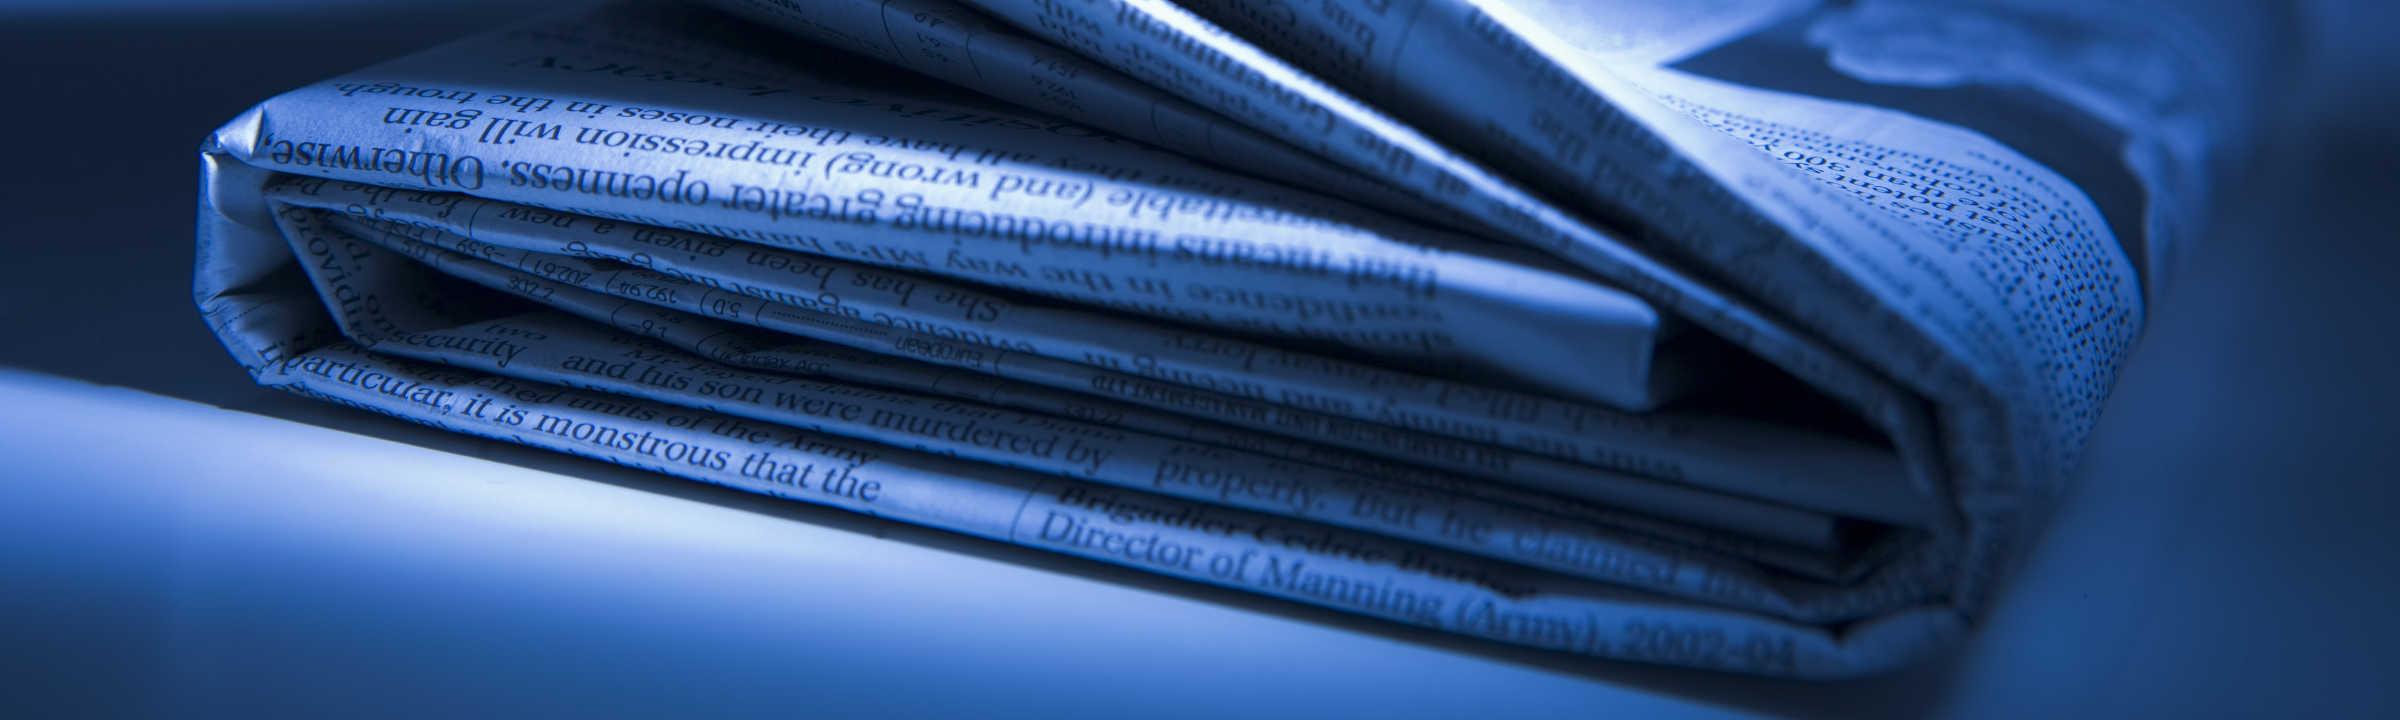 wvhb-krant-media